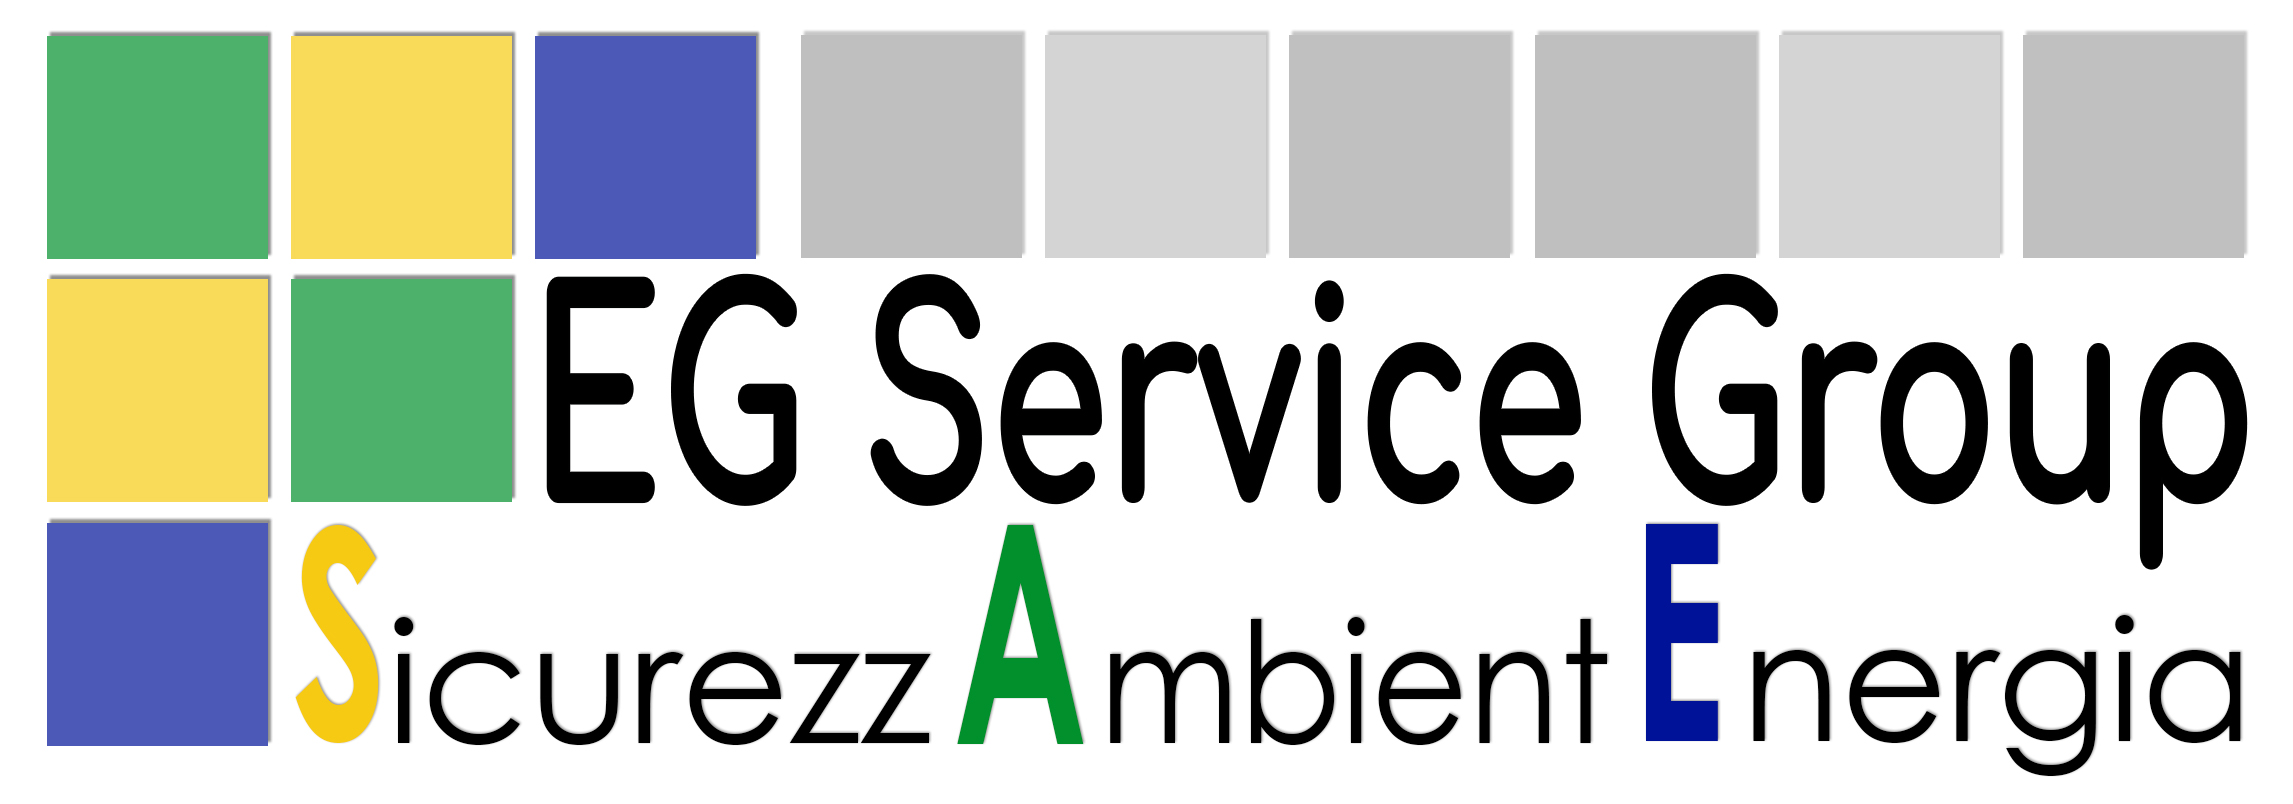 EG Service Group